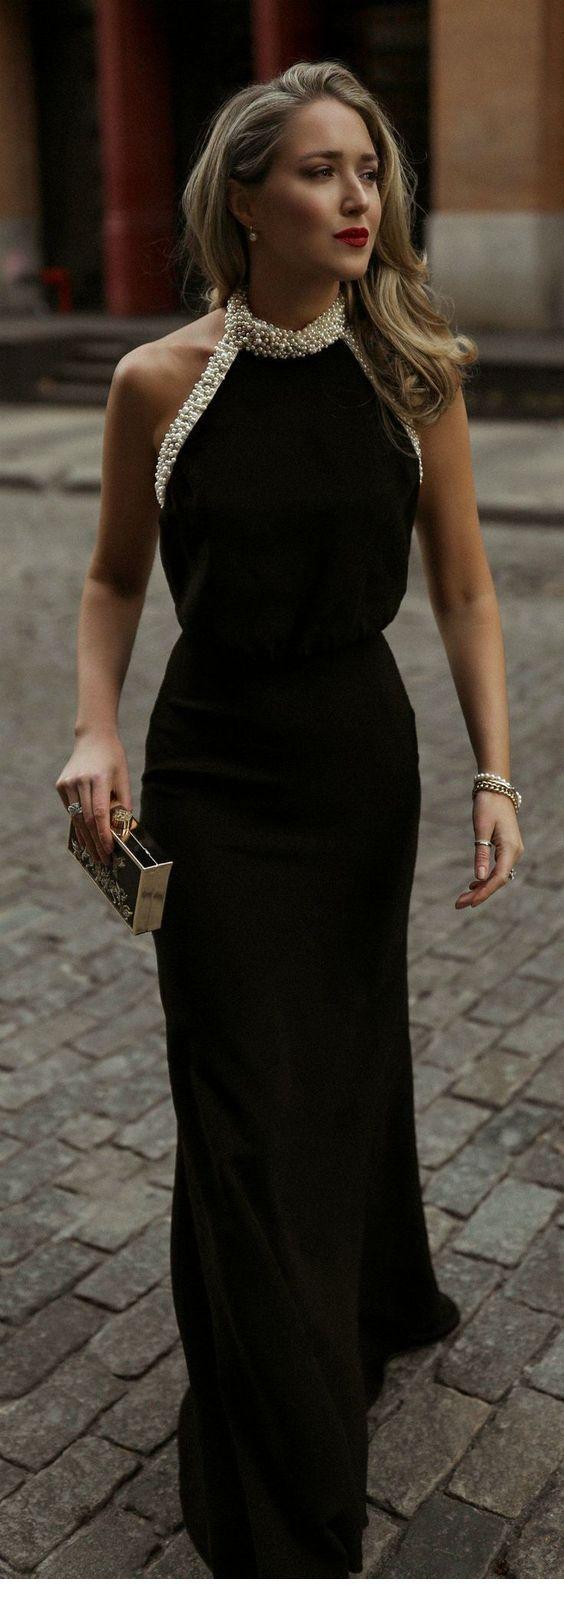 Classy Long Black Dress With Gold Accessories Long Black Dress Gala Dresses Fashion [ 1606 x 564 Pixel ]